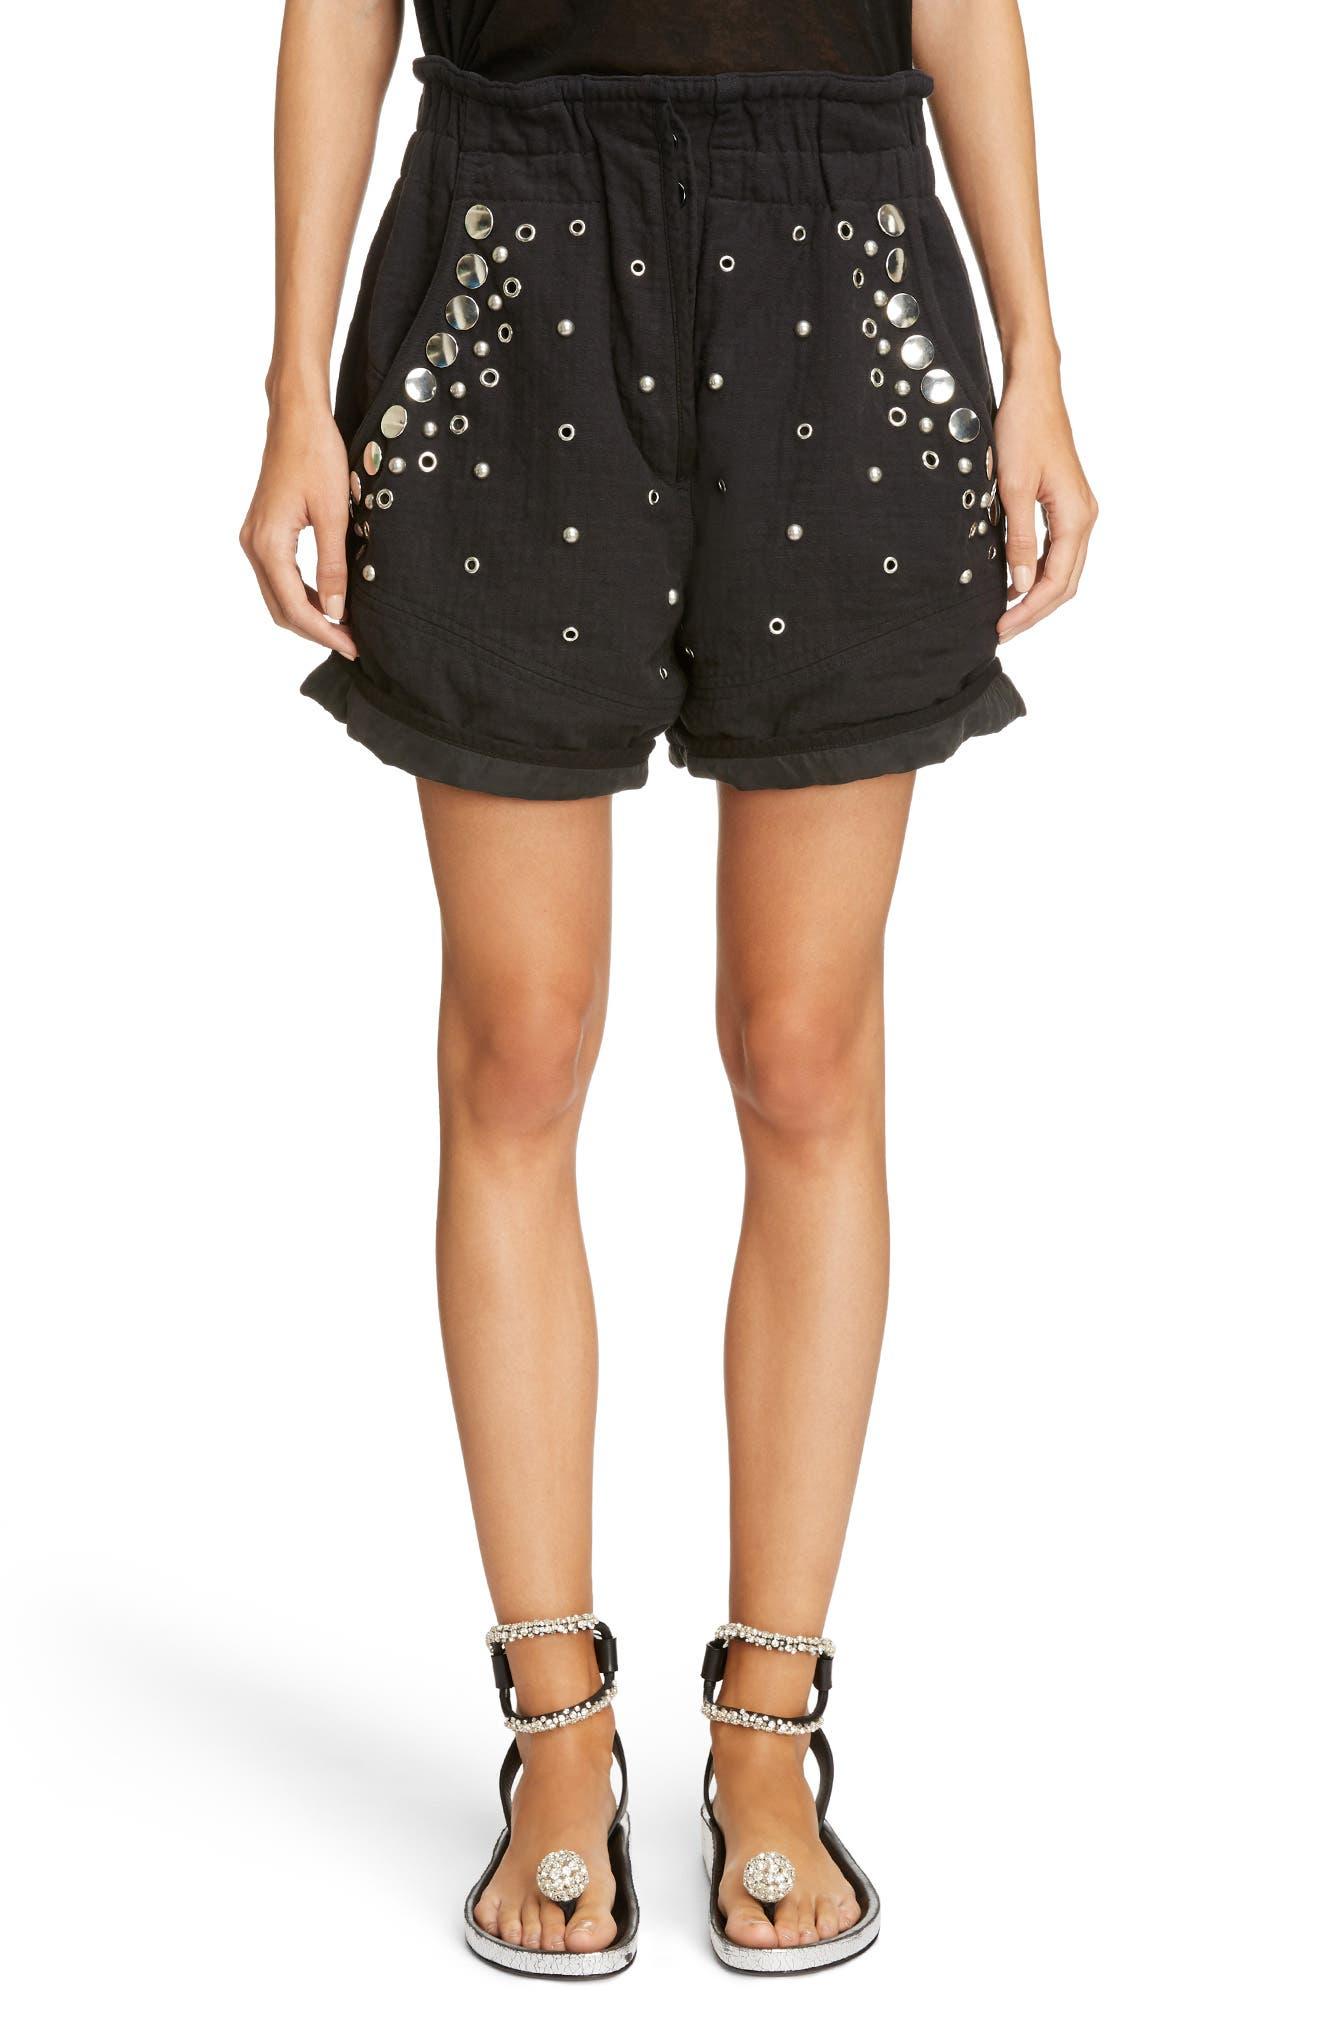 Isabel Marant Grommet & Stud Shorts